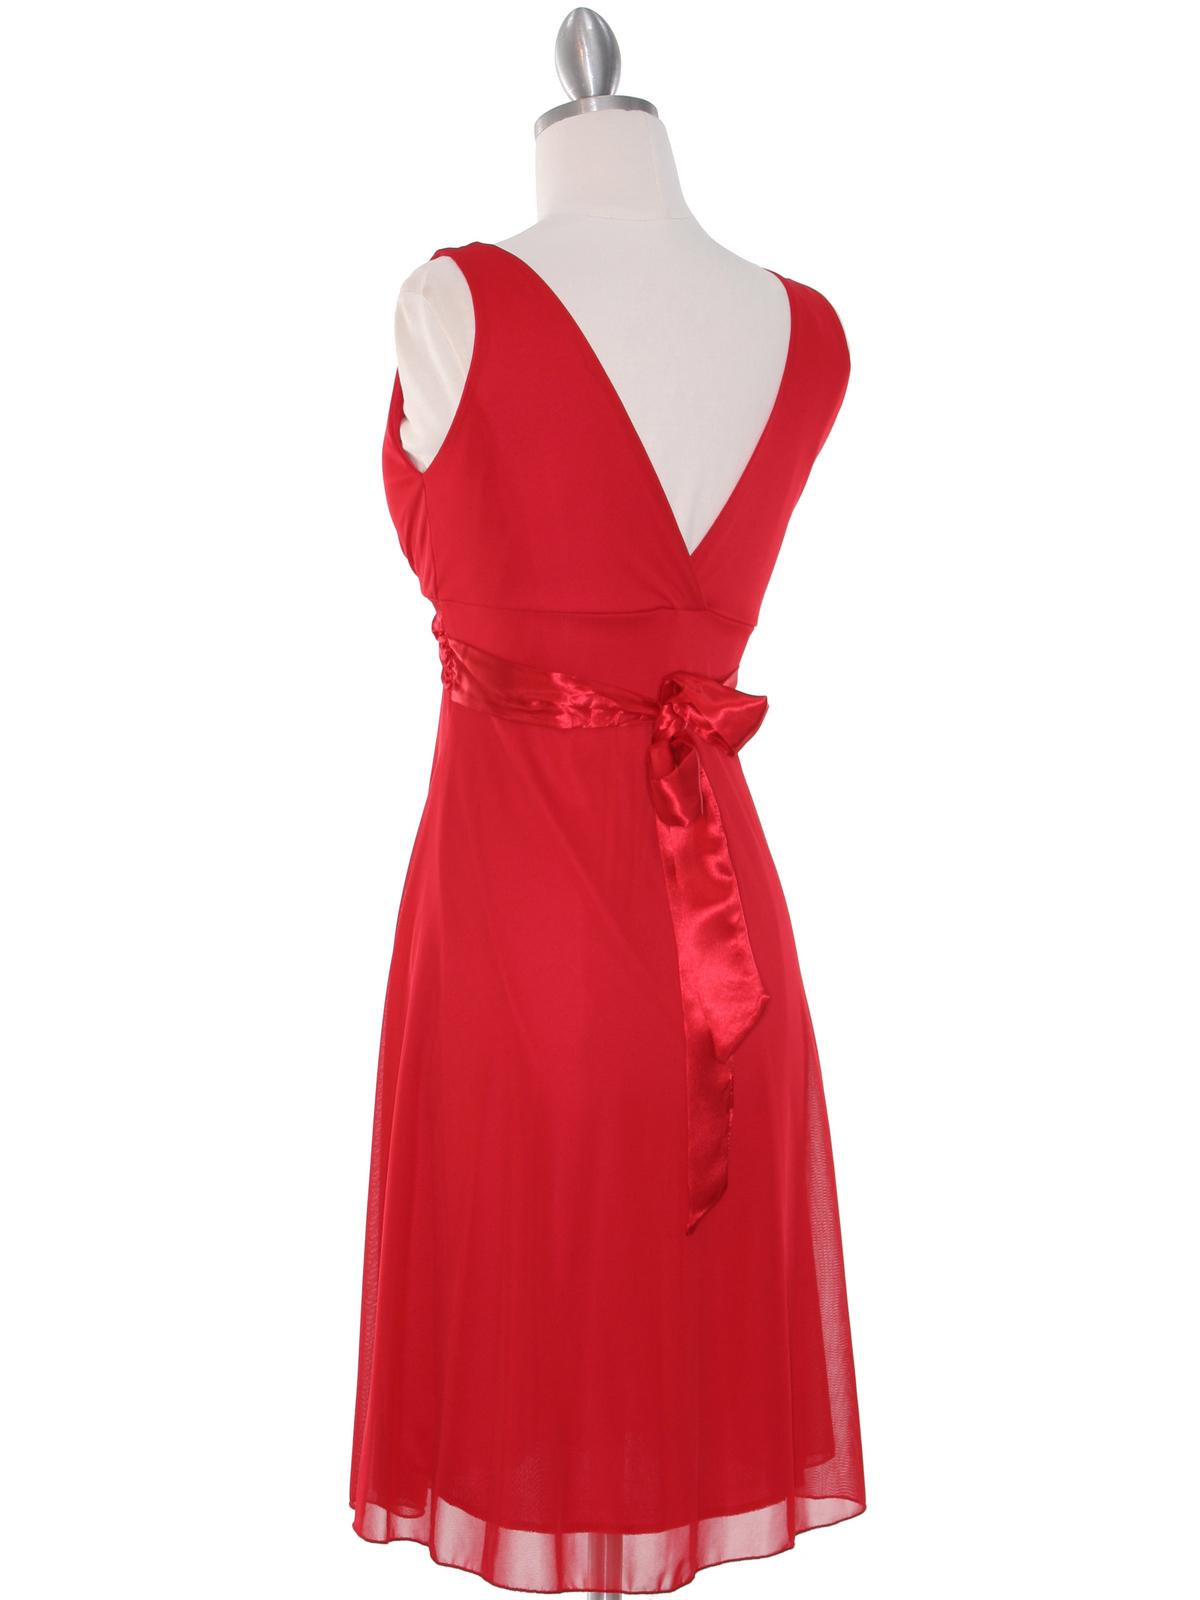 Missy Knit Cocktail Dress | Sung Boutique L.A.